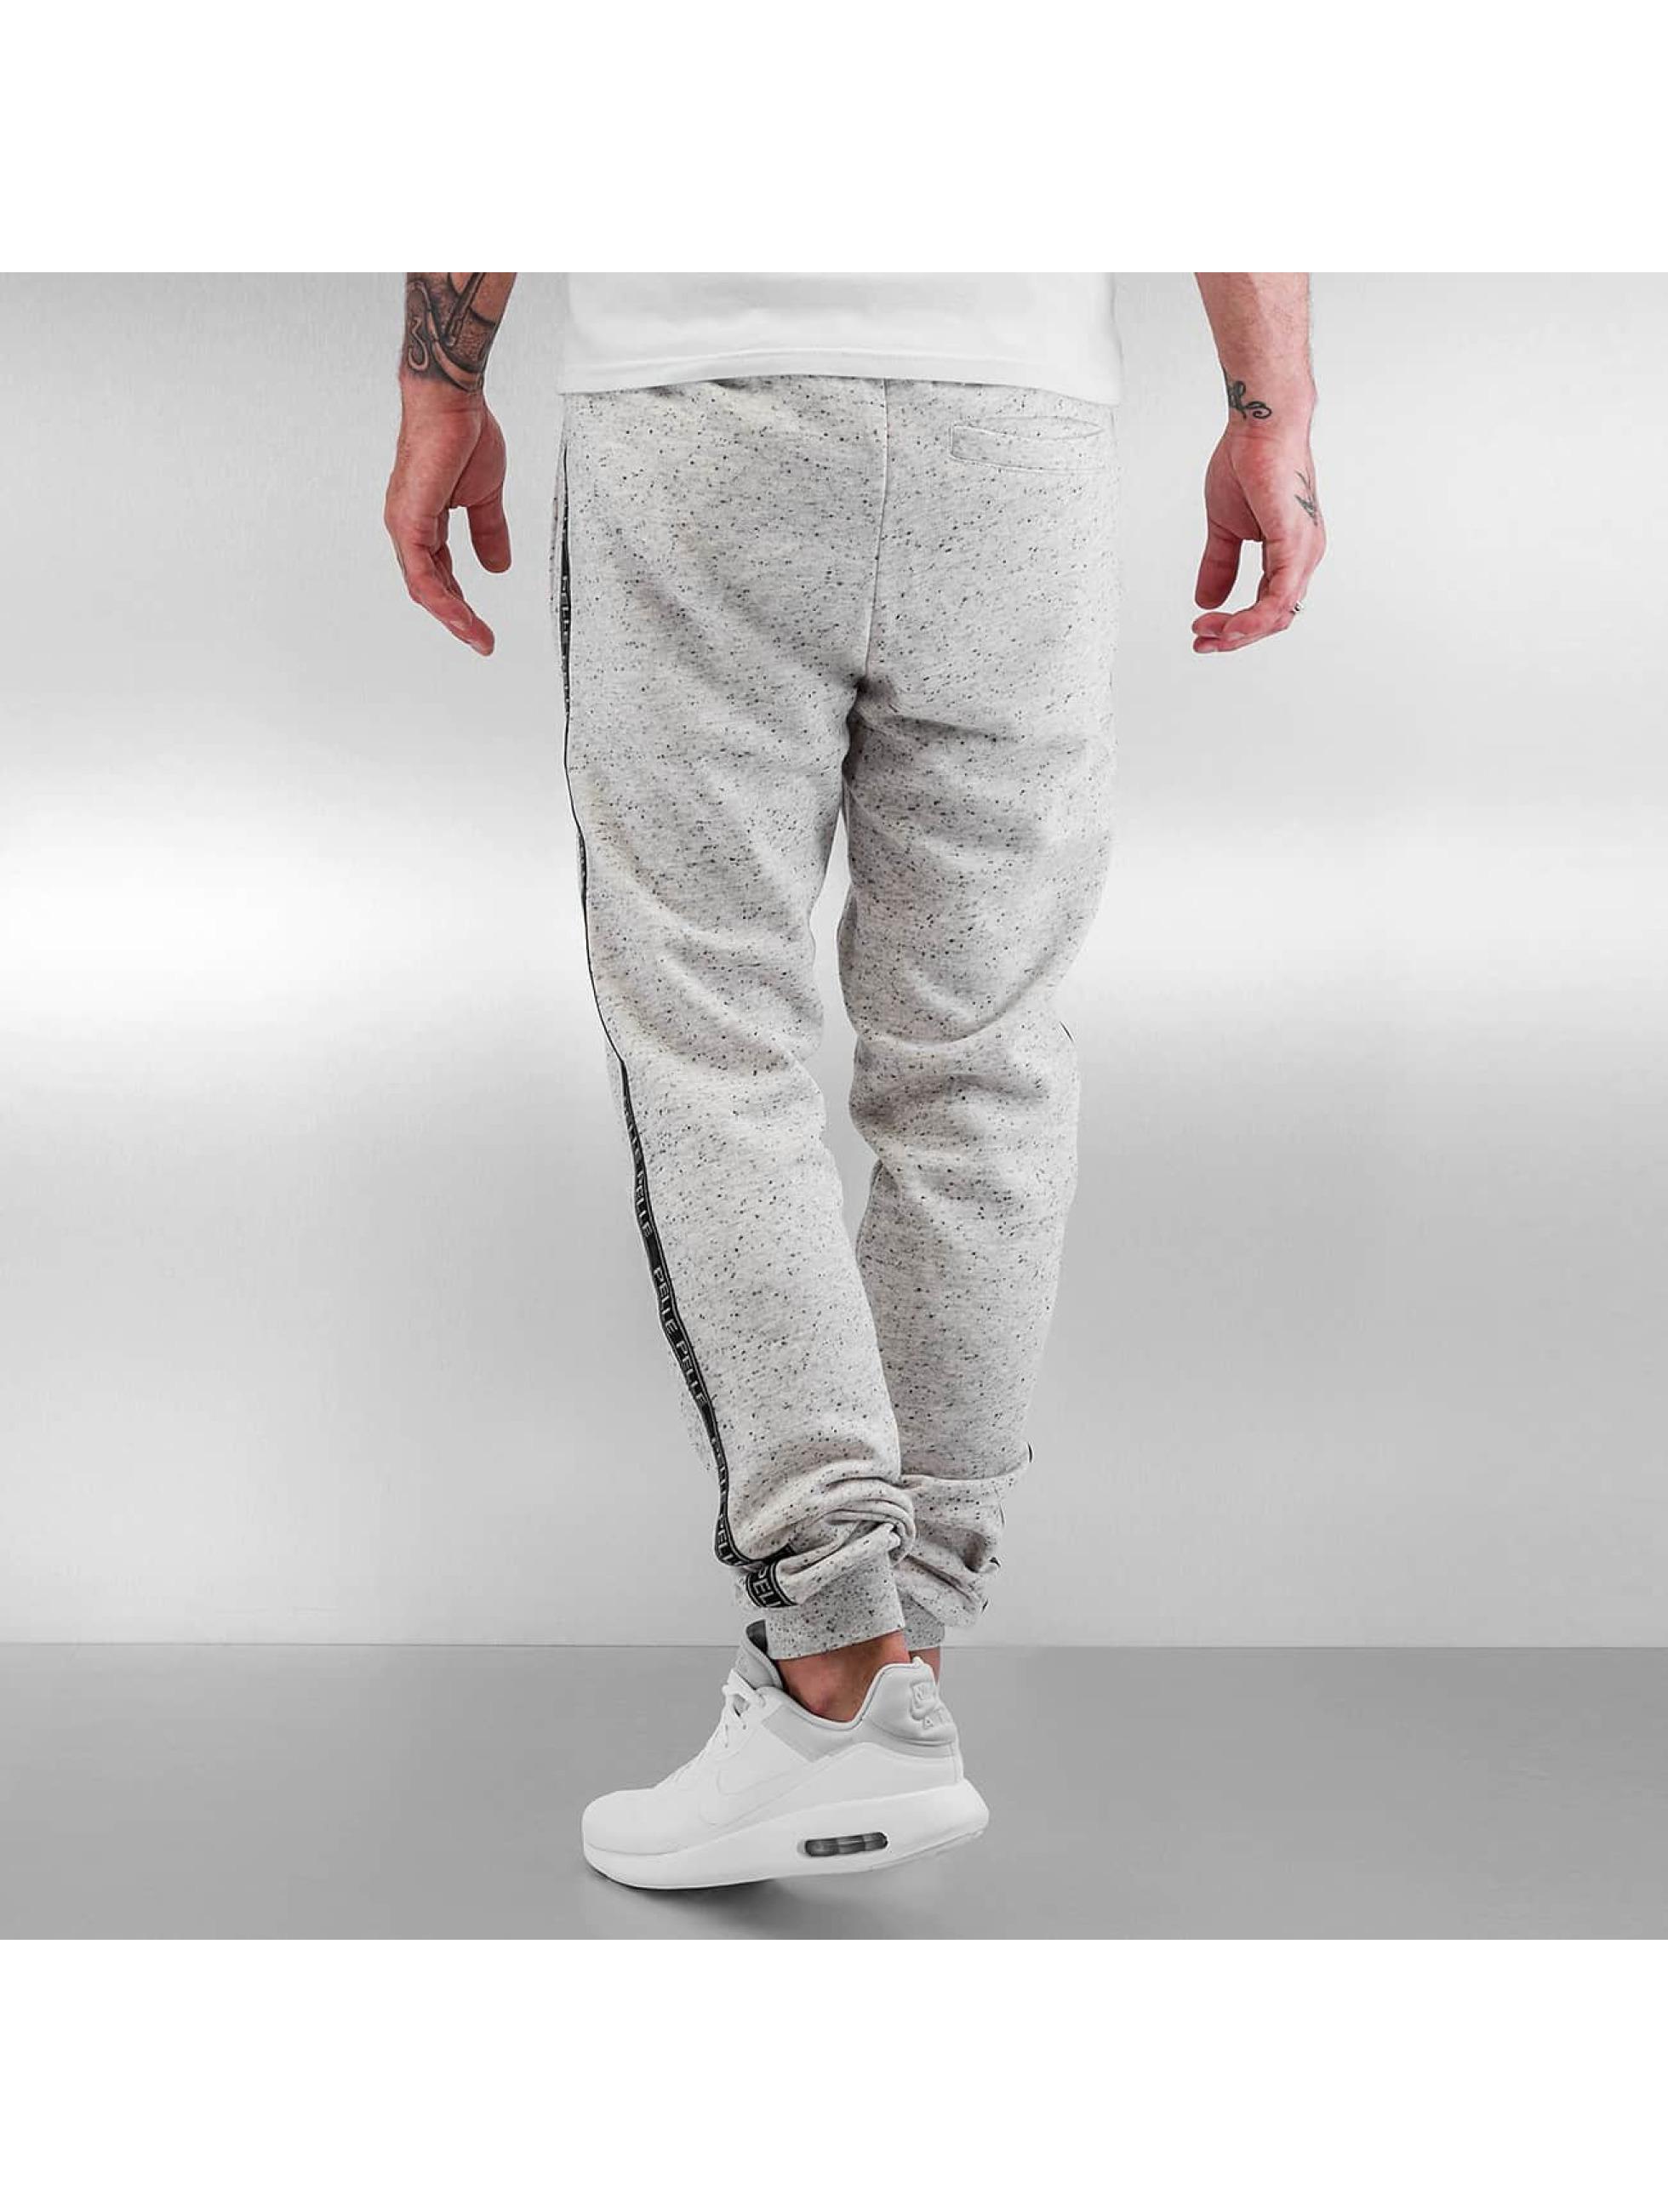 Pelle Pelle Sweat Pant Tapemasters gray